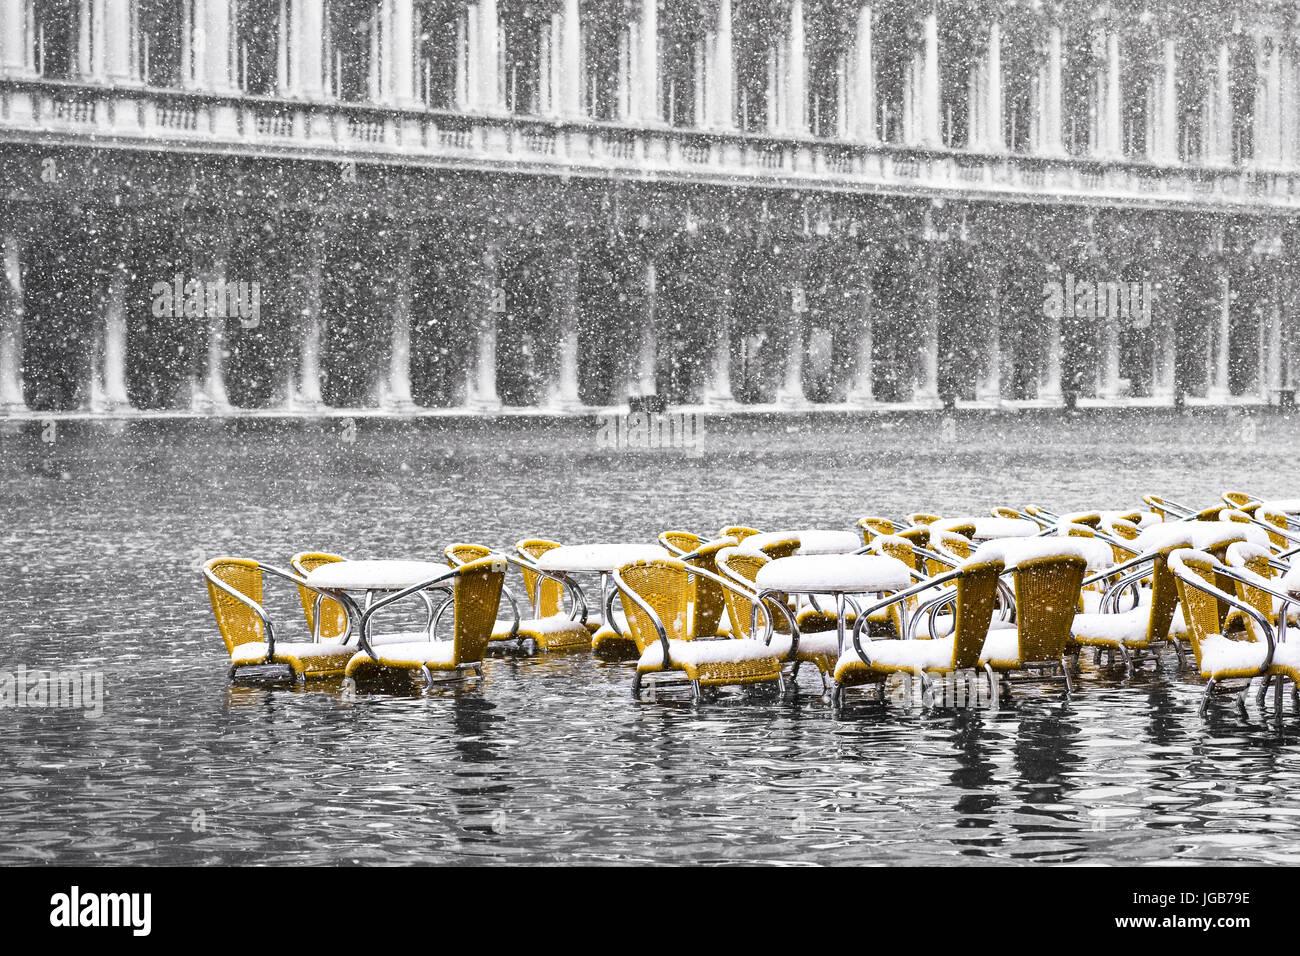 Marea Alta en Venecia, Italia. Foto de stock